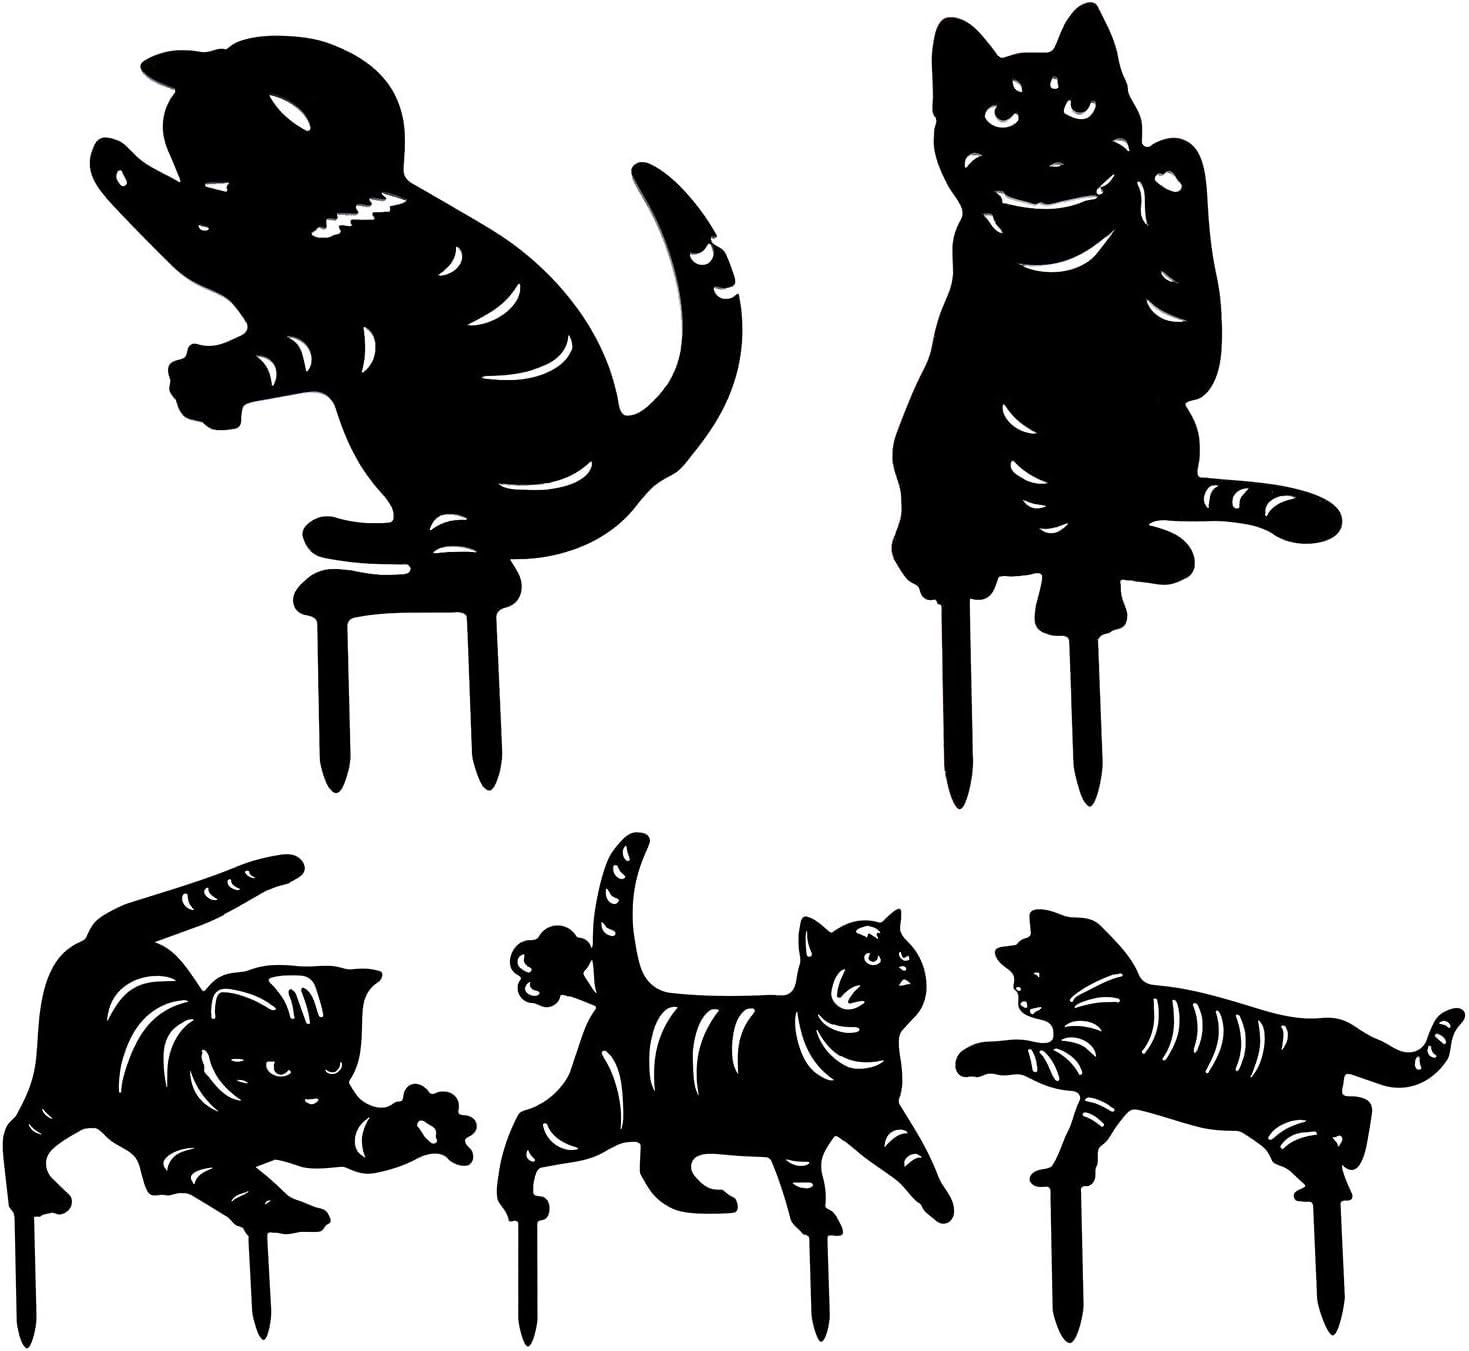 APVTI 5Pcs Cat Yard Art, Garden Lawn Floor Decoration, Acrylic Cat Art Outdoor Yard Decor (Set)